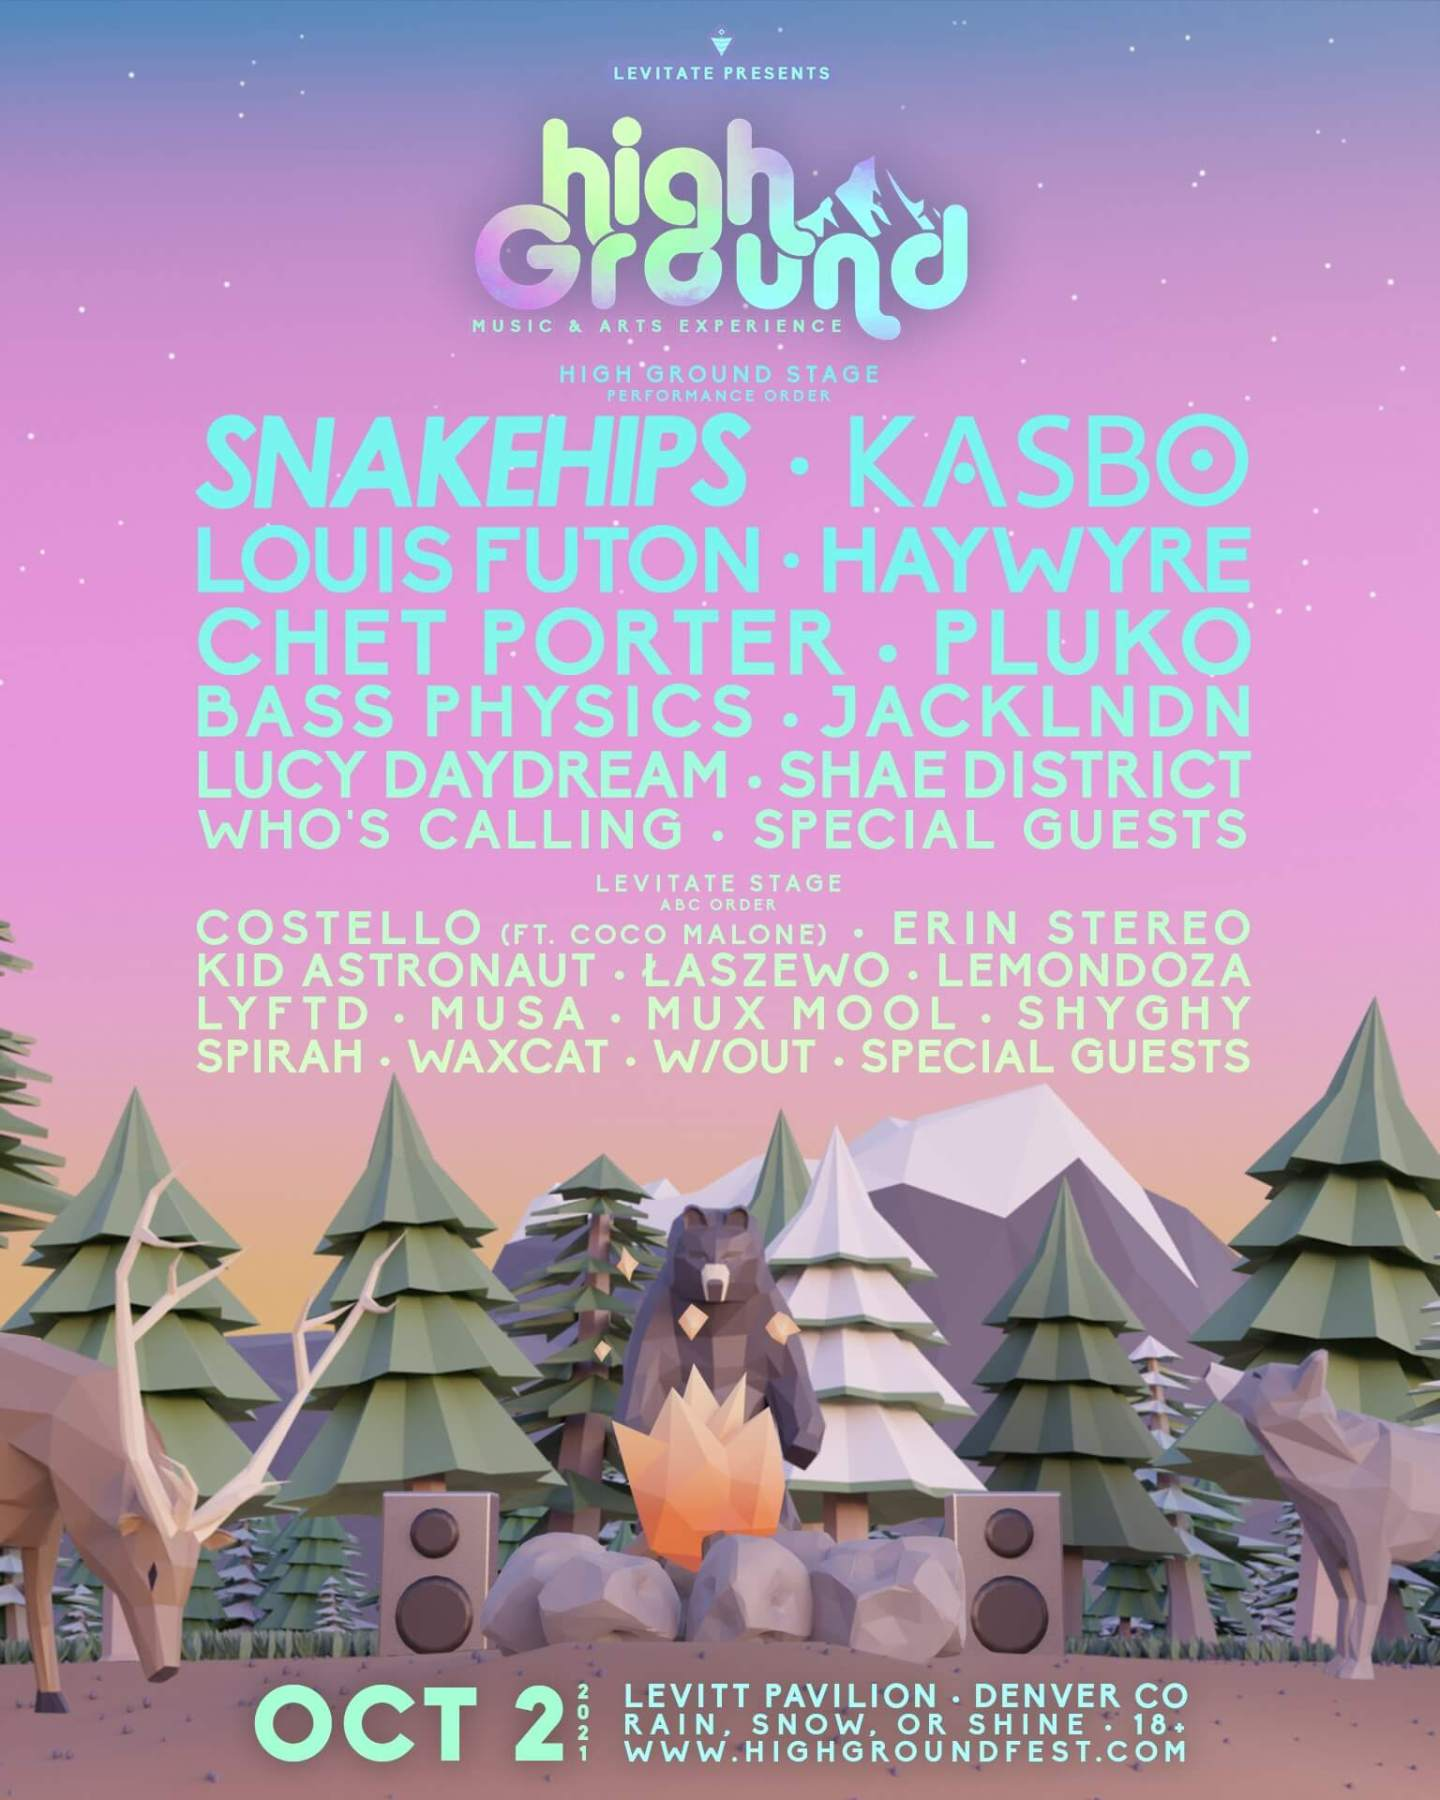 high ground festival ineup